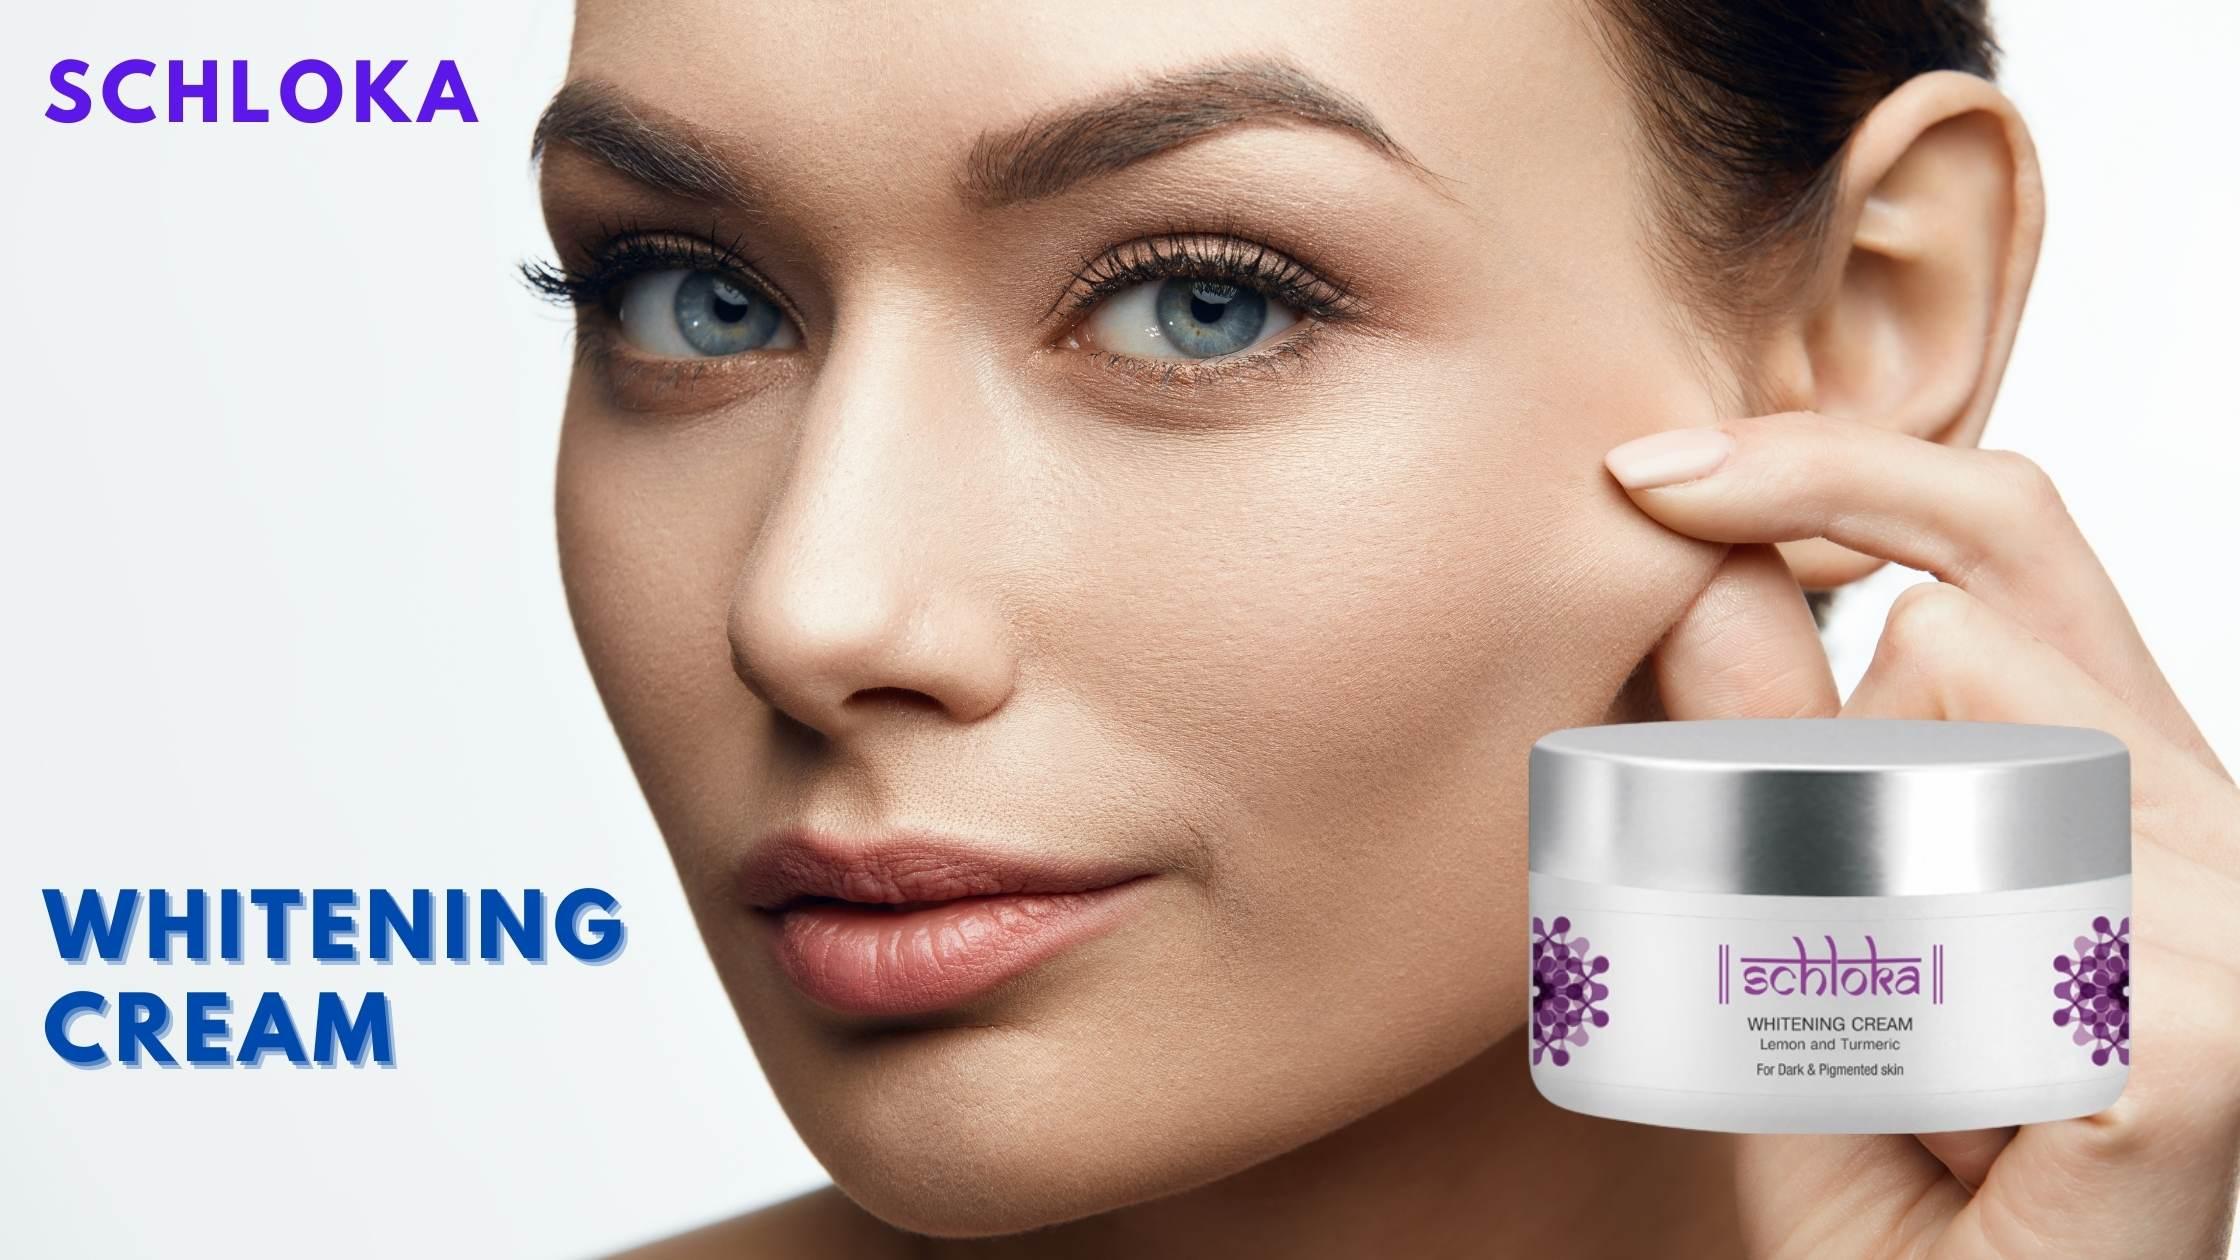 Modicare Whitening Cream Schloka Product